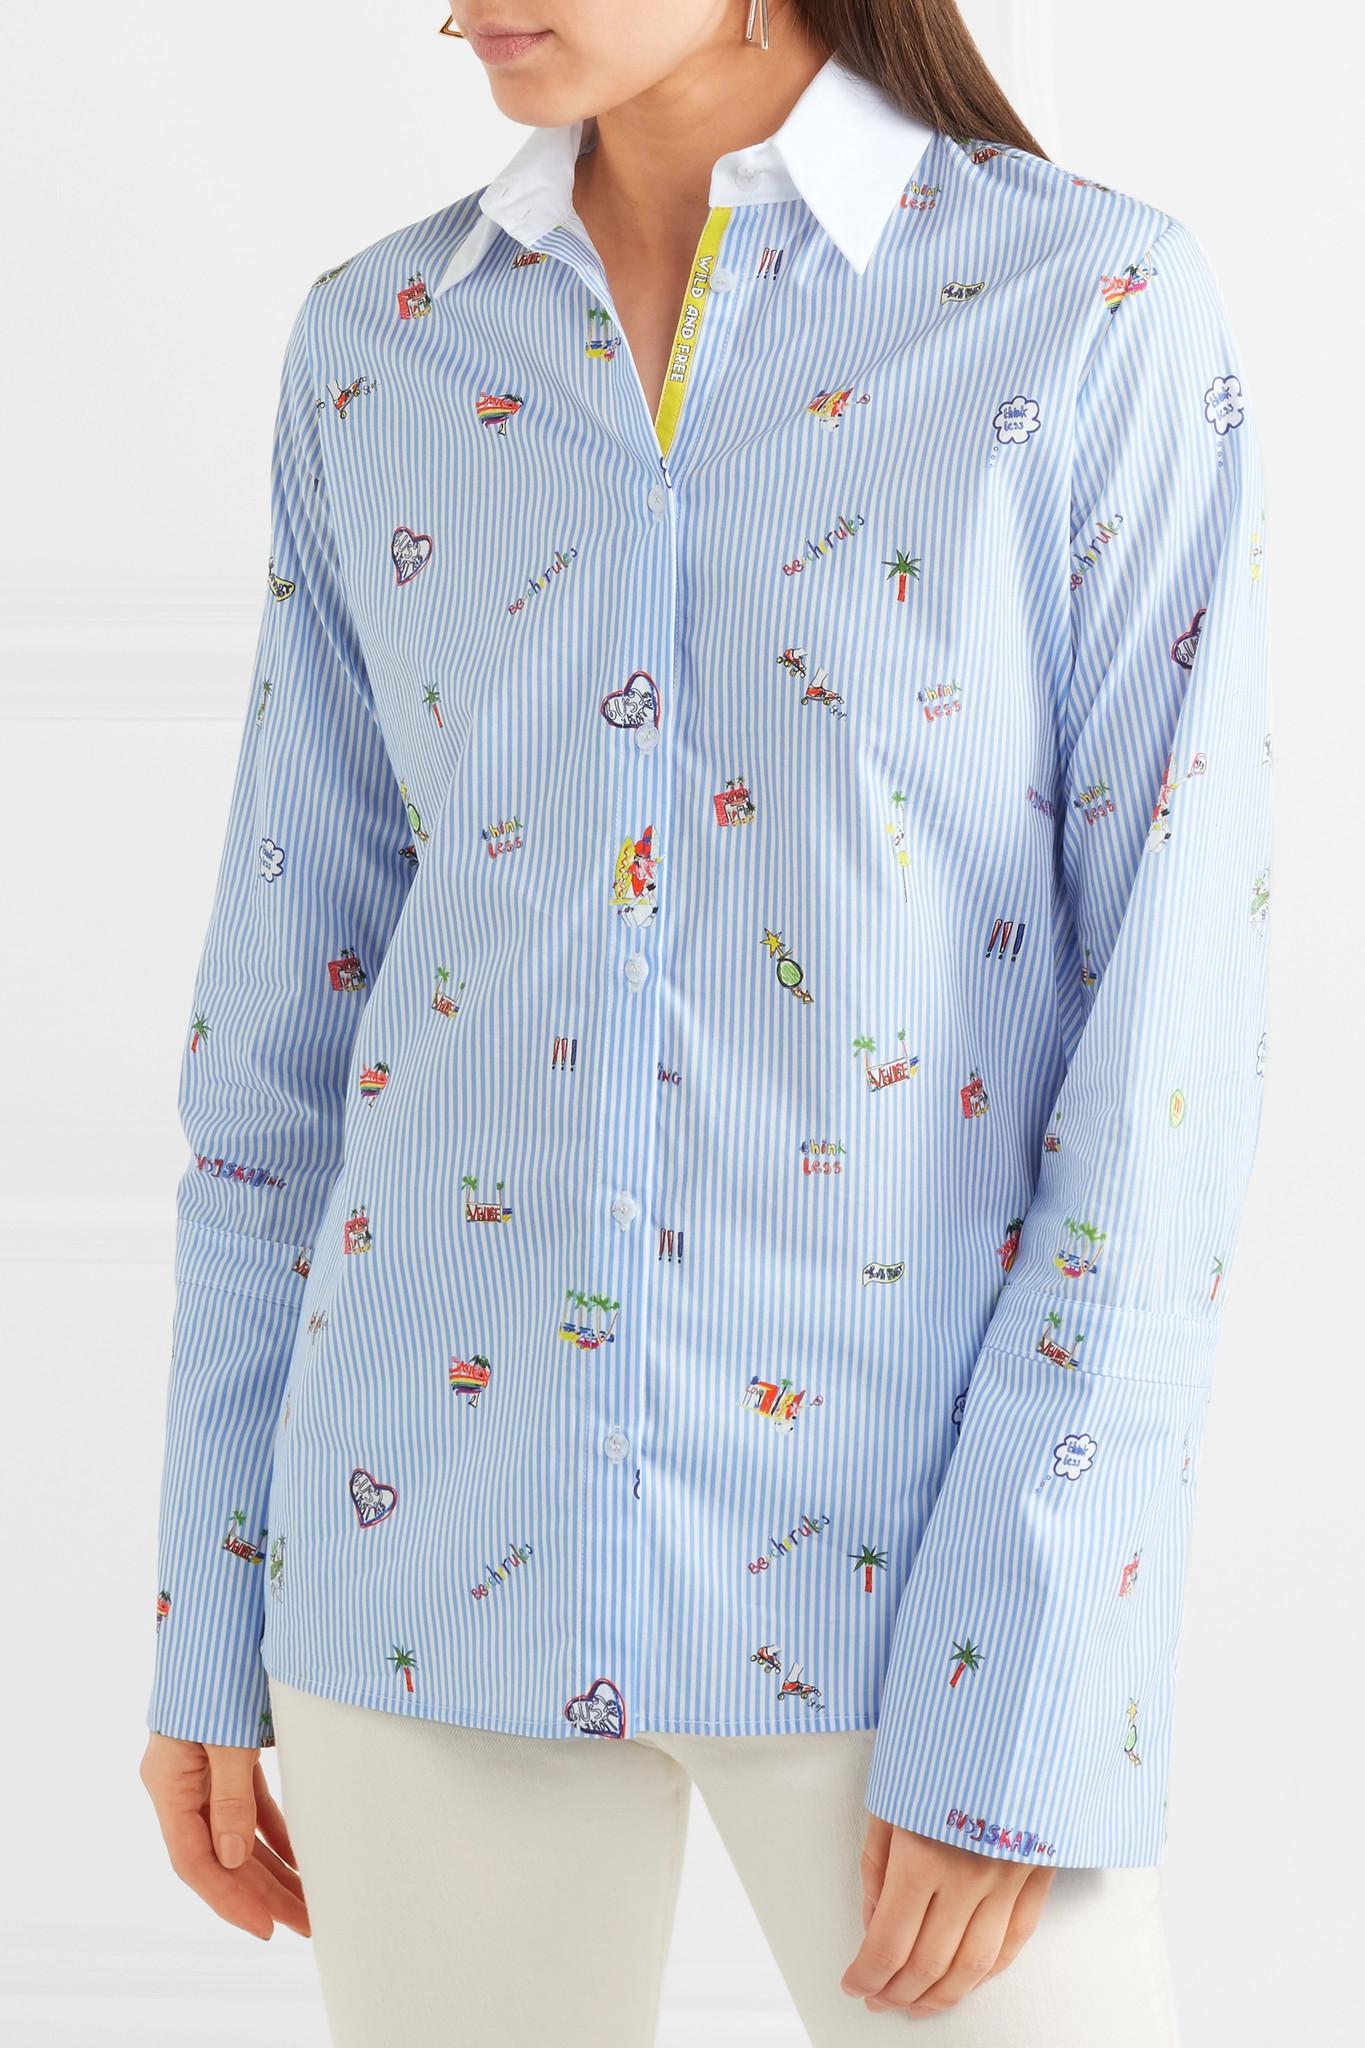 Womens Venice Beach-Print Cotton Blouse Mira Mikati Cheap 100% Guaranteed cIETUcuv